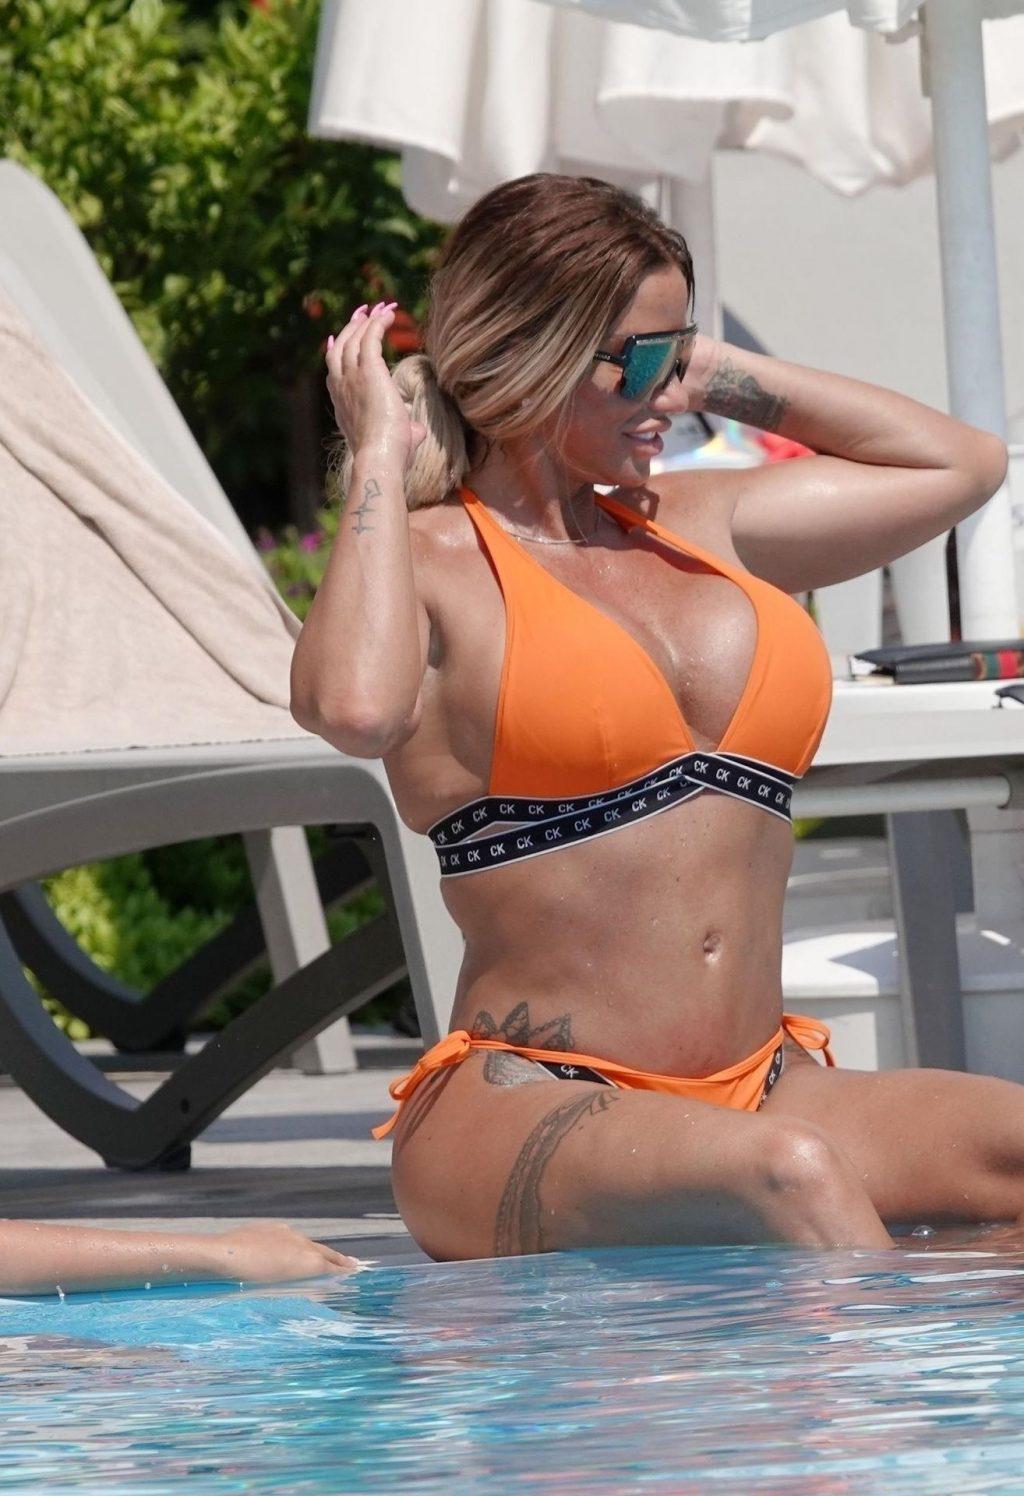 Katie Price Flaunts Her Big Fake Boobs on Holiday in Turkey (46 Photos)